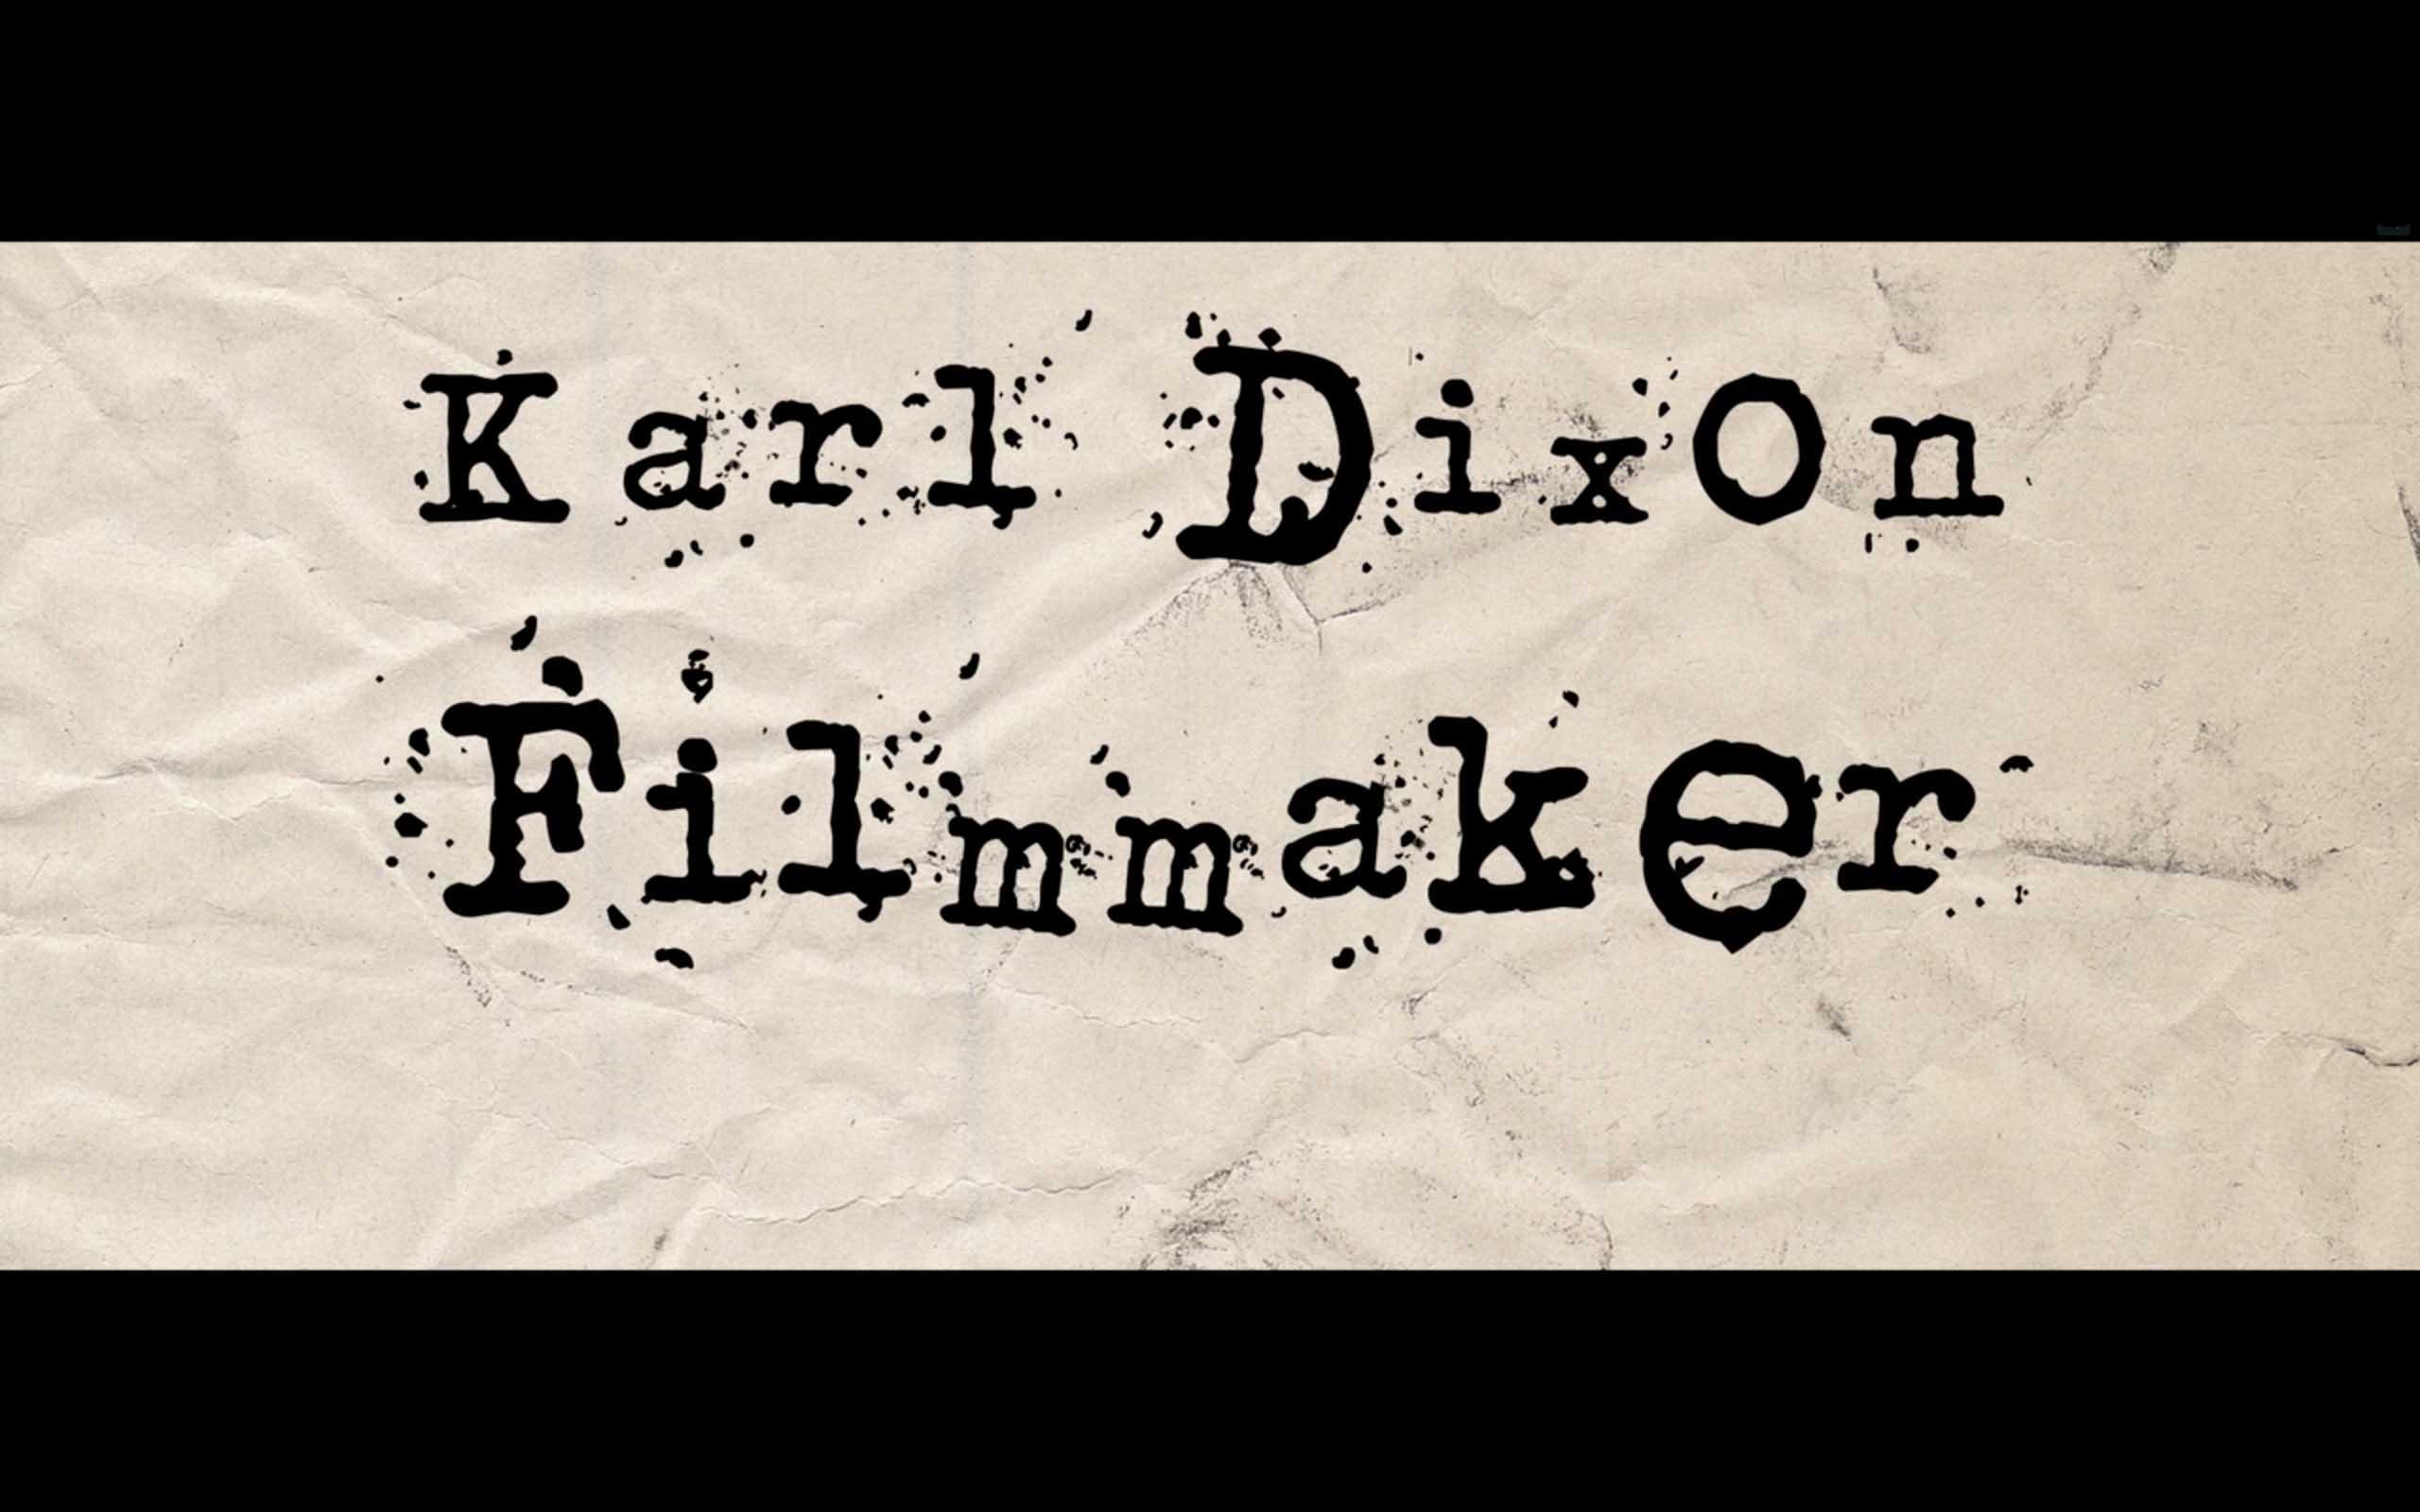 TEAM: KARL DIXON